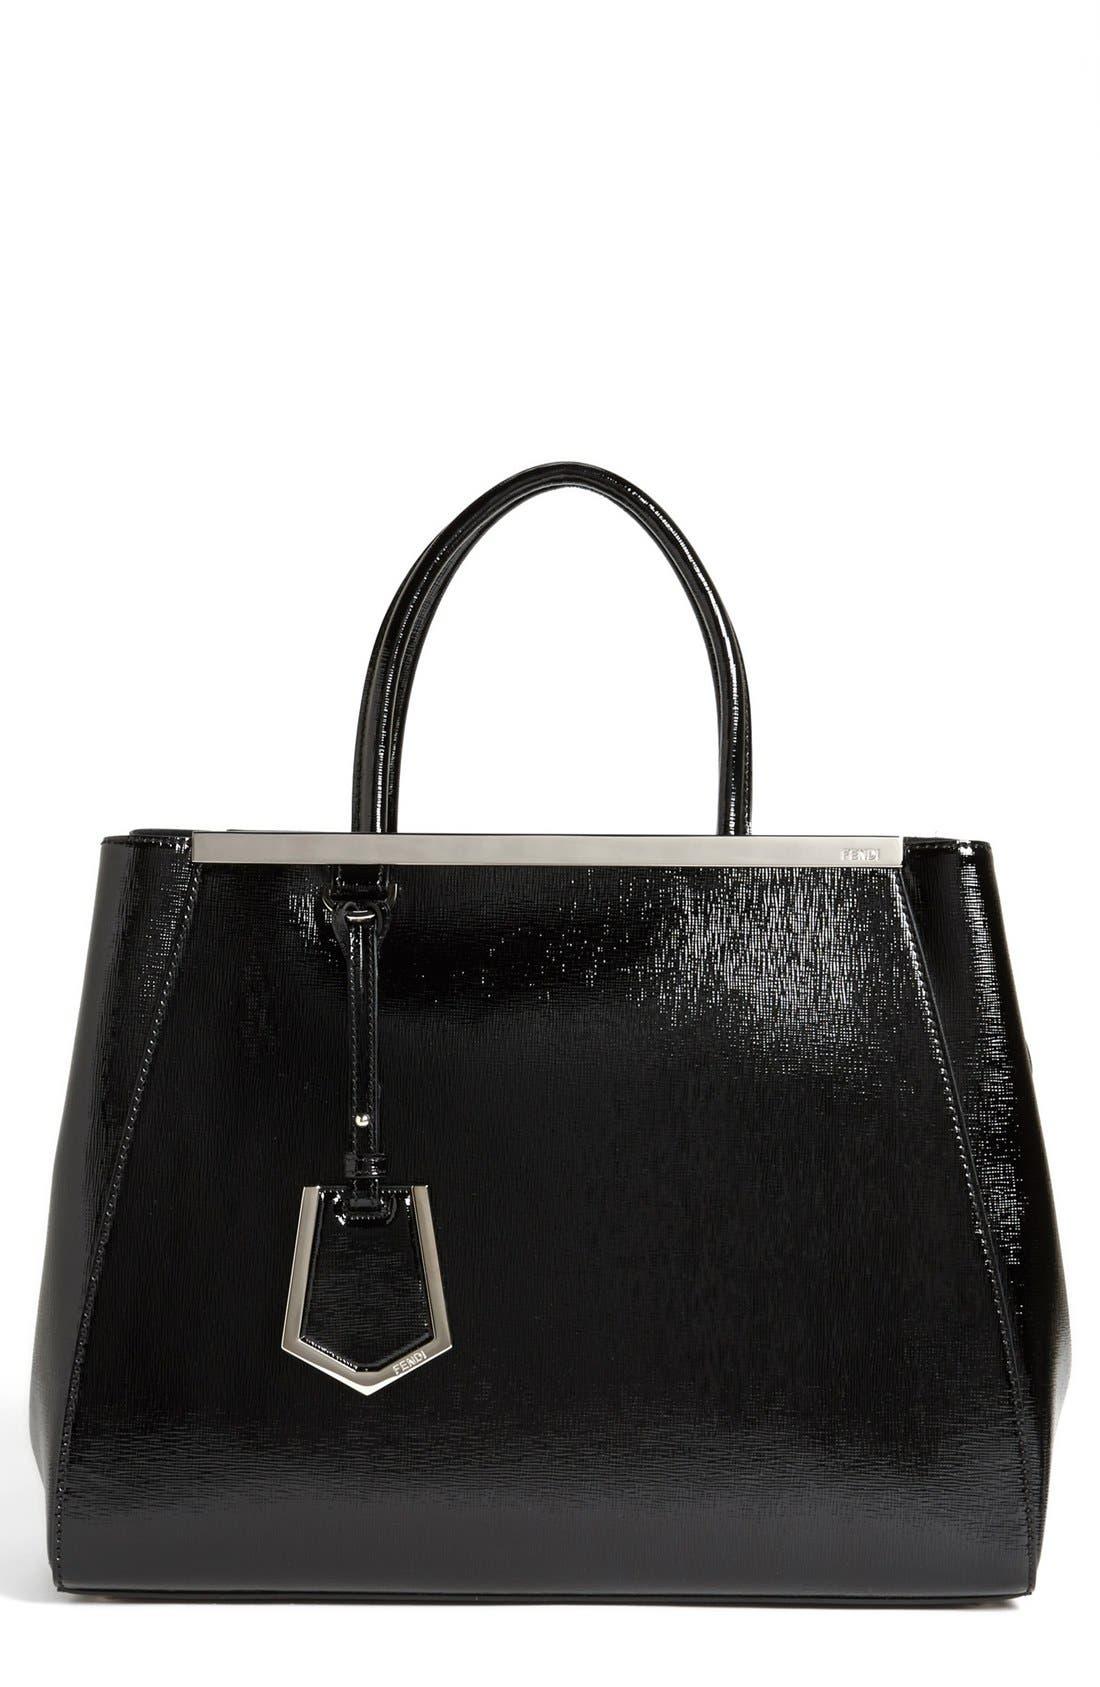 Alternate Image 1 Selected - Fendi 'Medium 2Jours' Leather Shopper